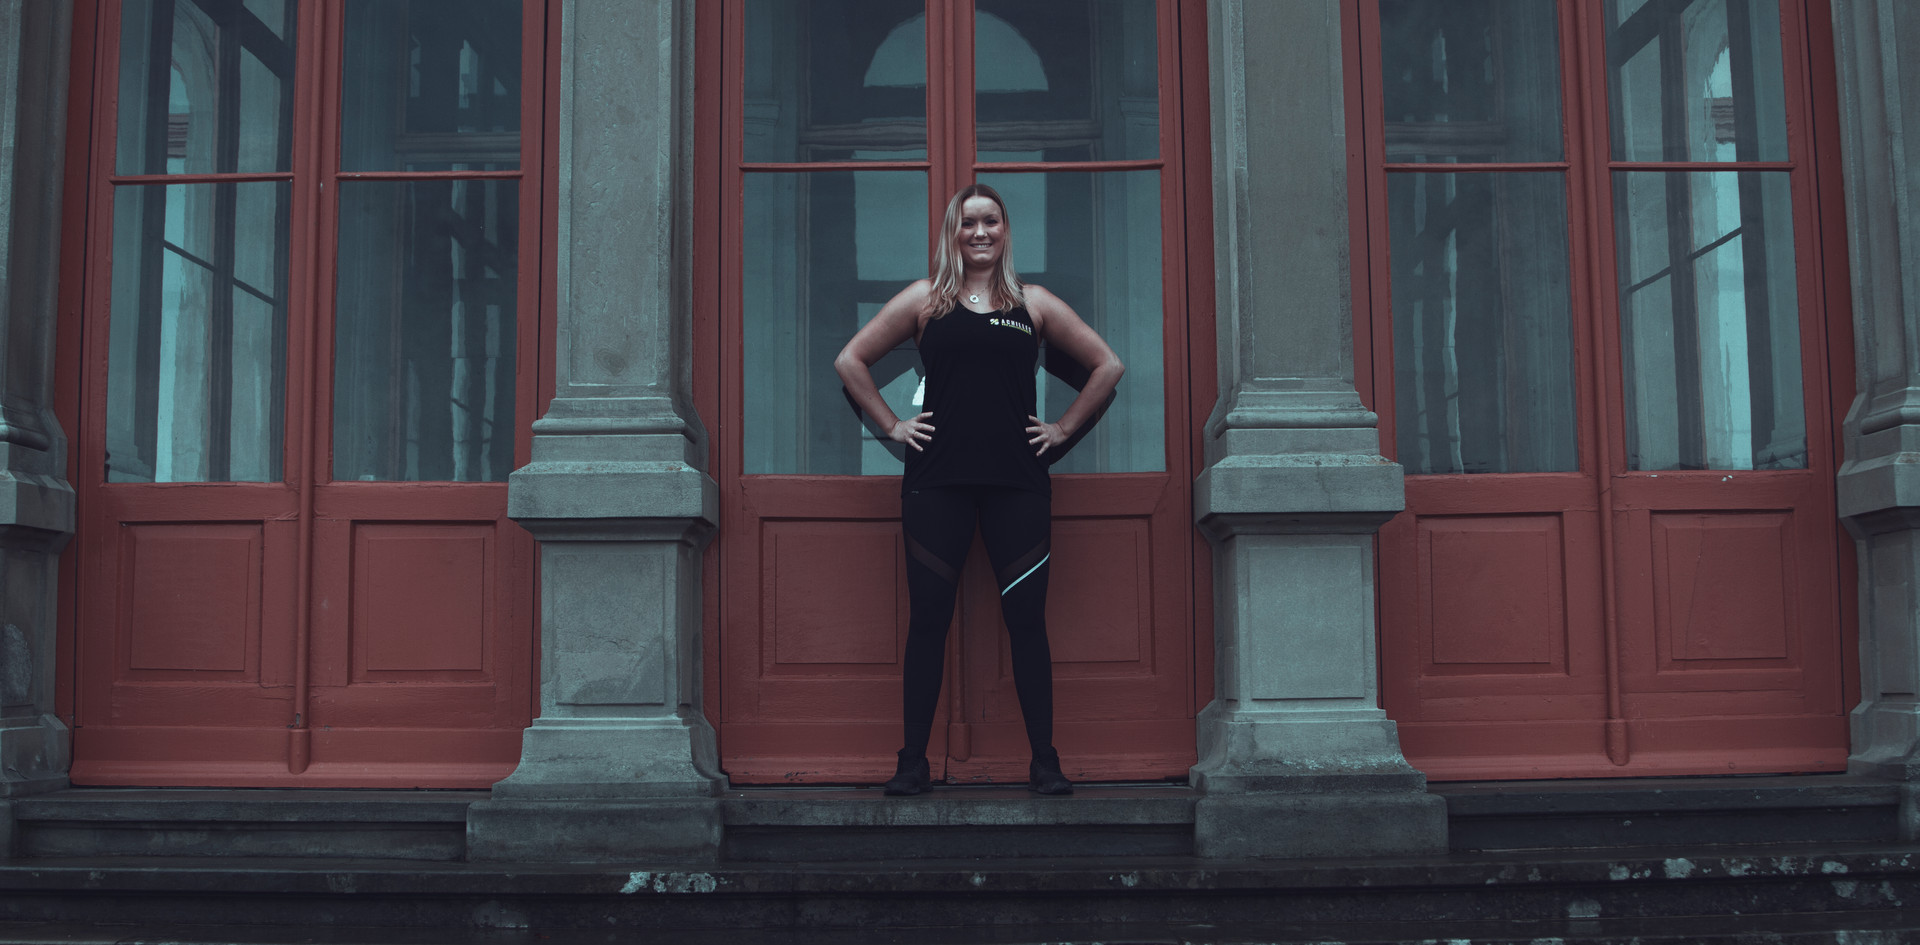 Trainerin Vanessa